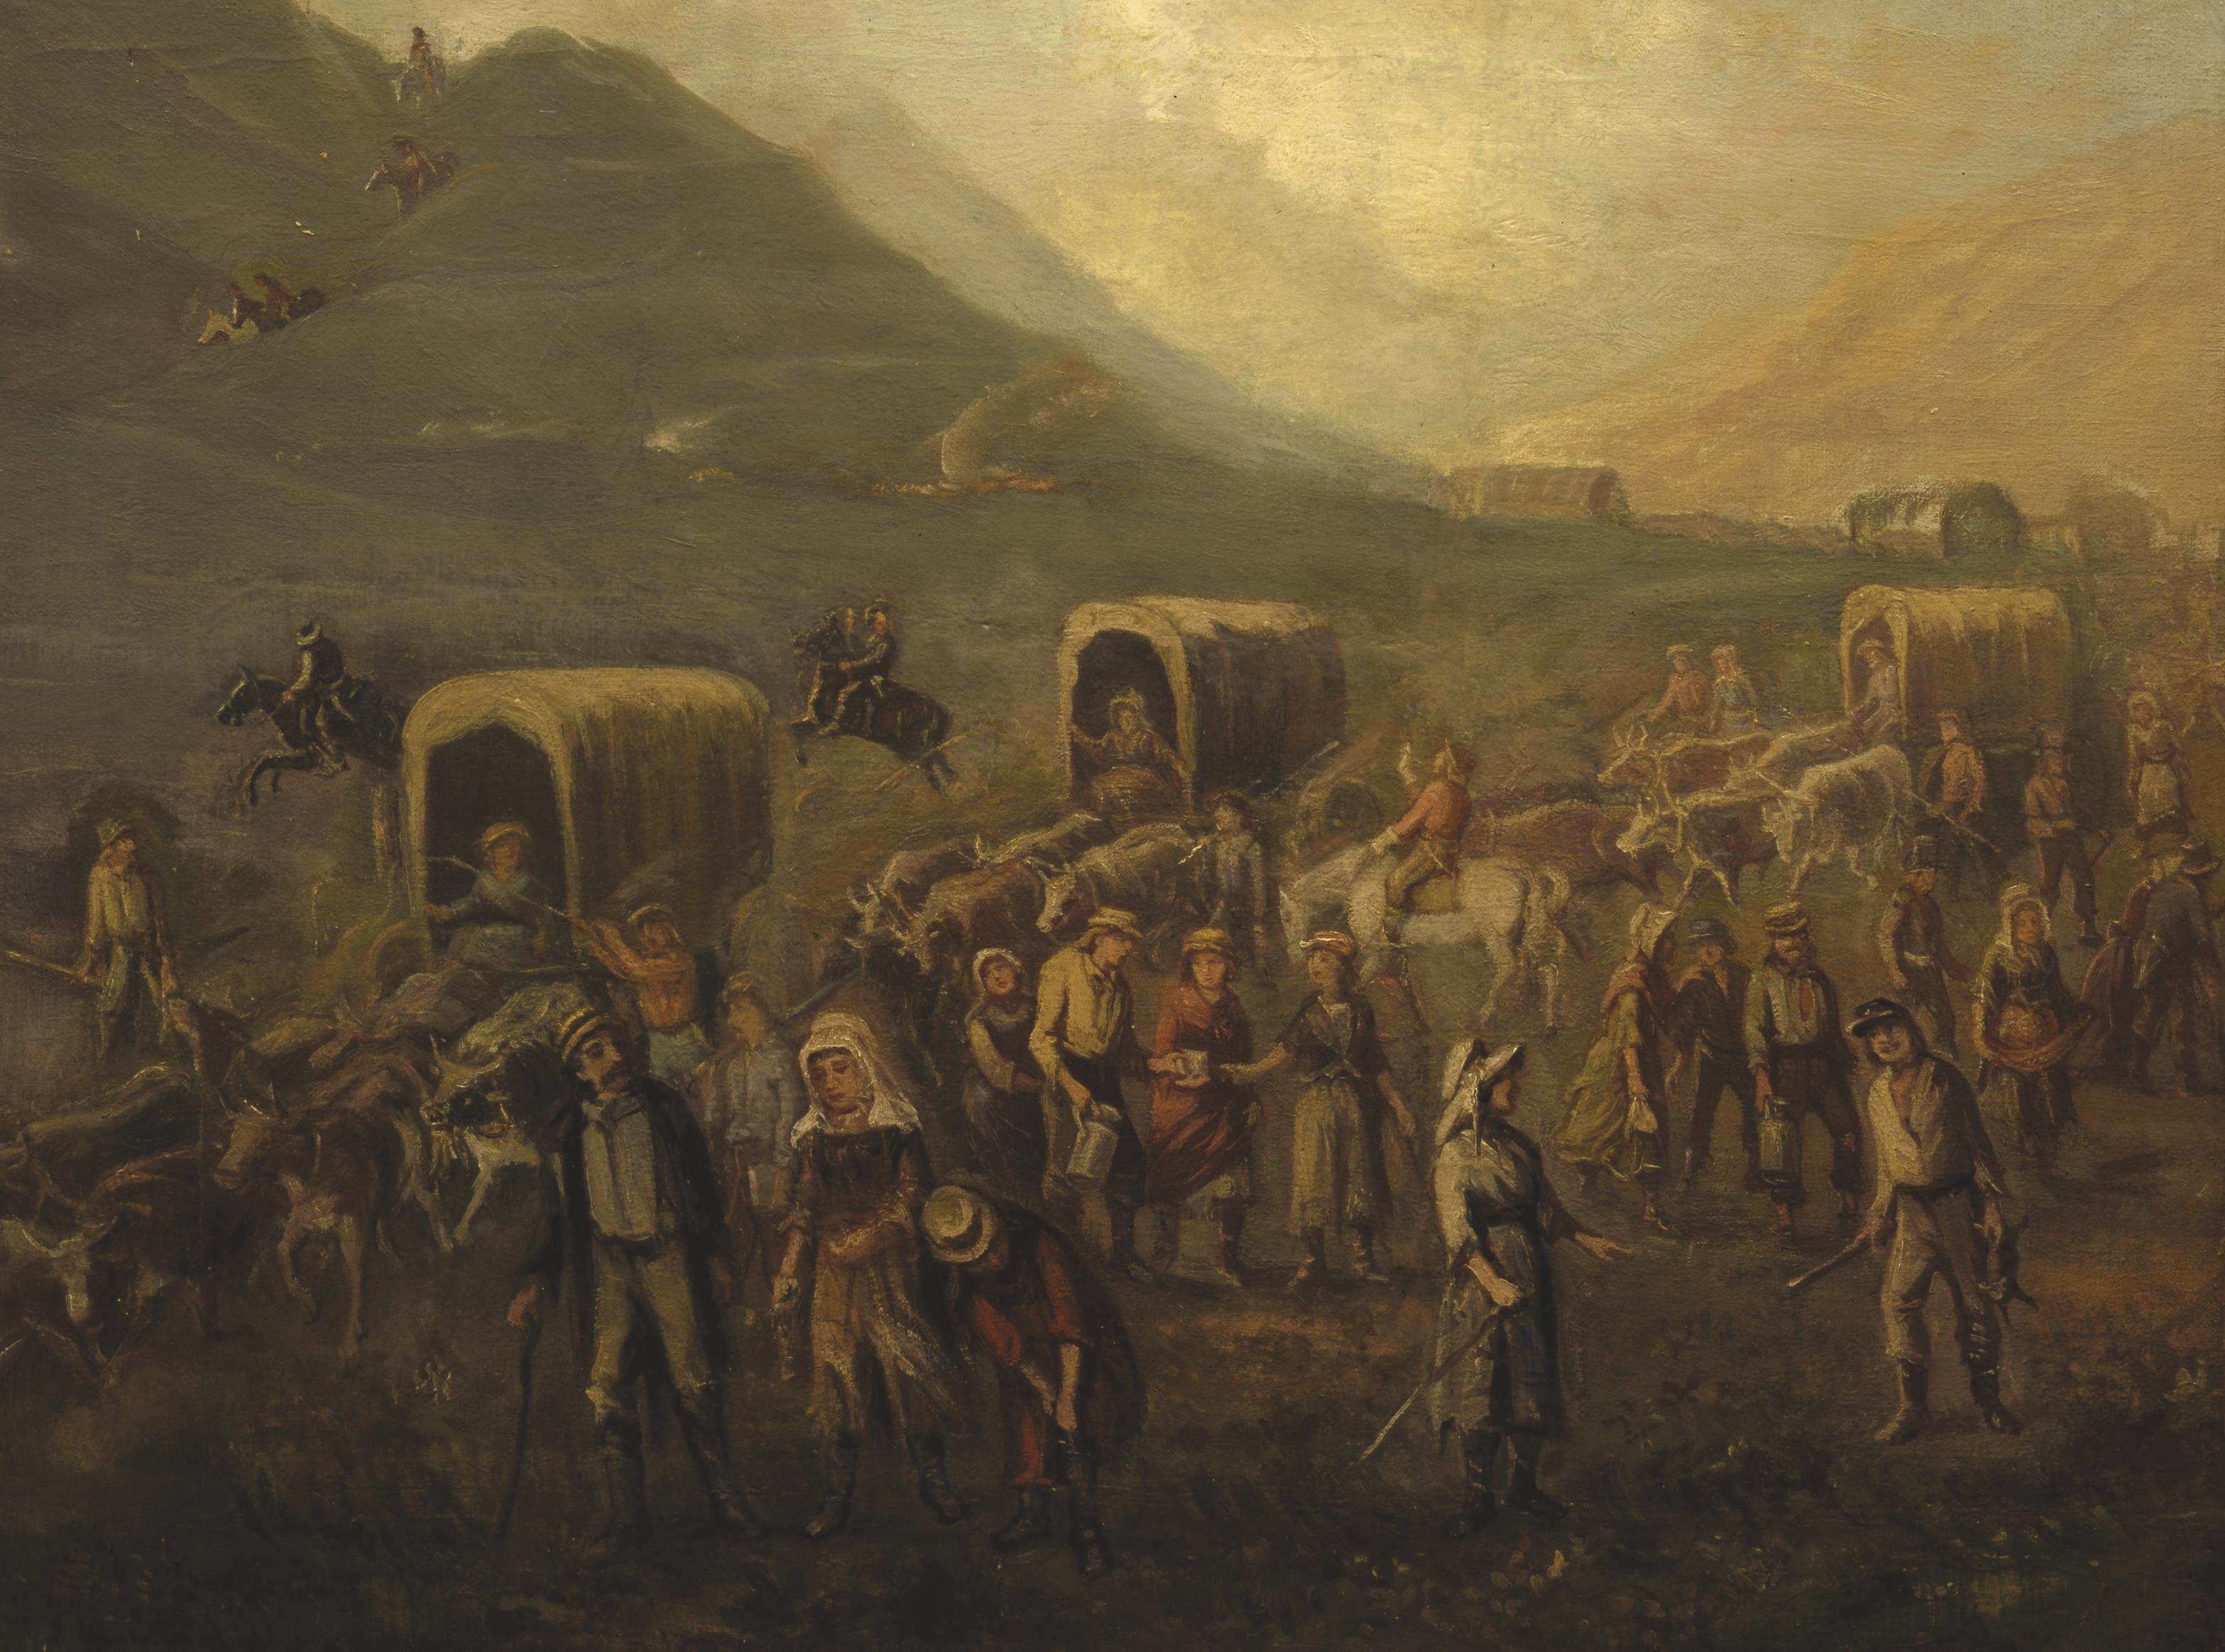 Mormon Emigrants Crossing the Plains in 1862, by Danquart Anthon Weggeland